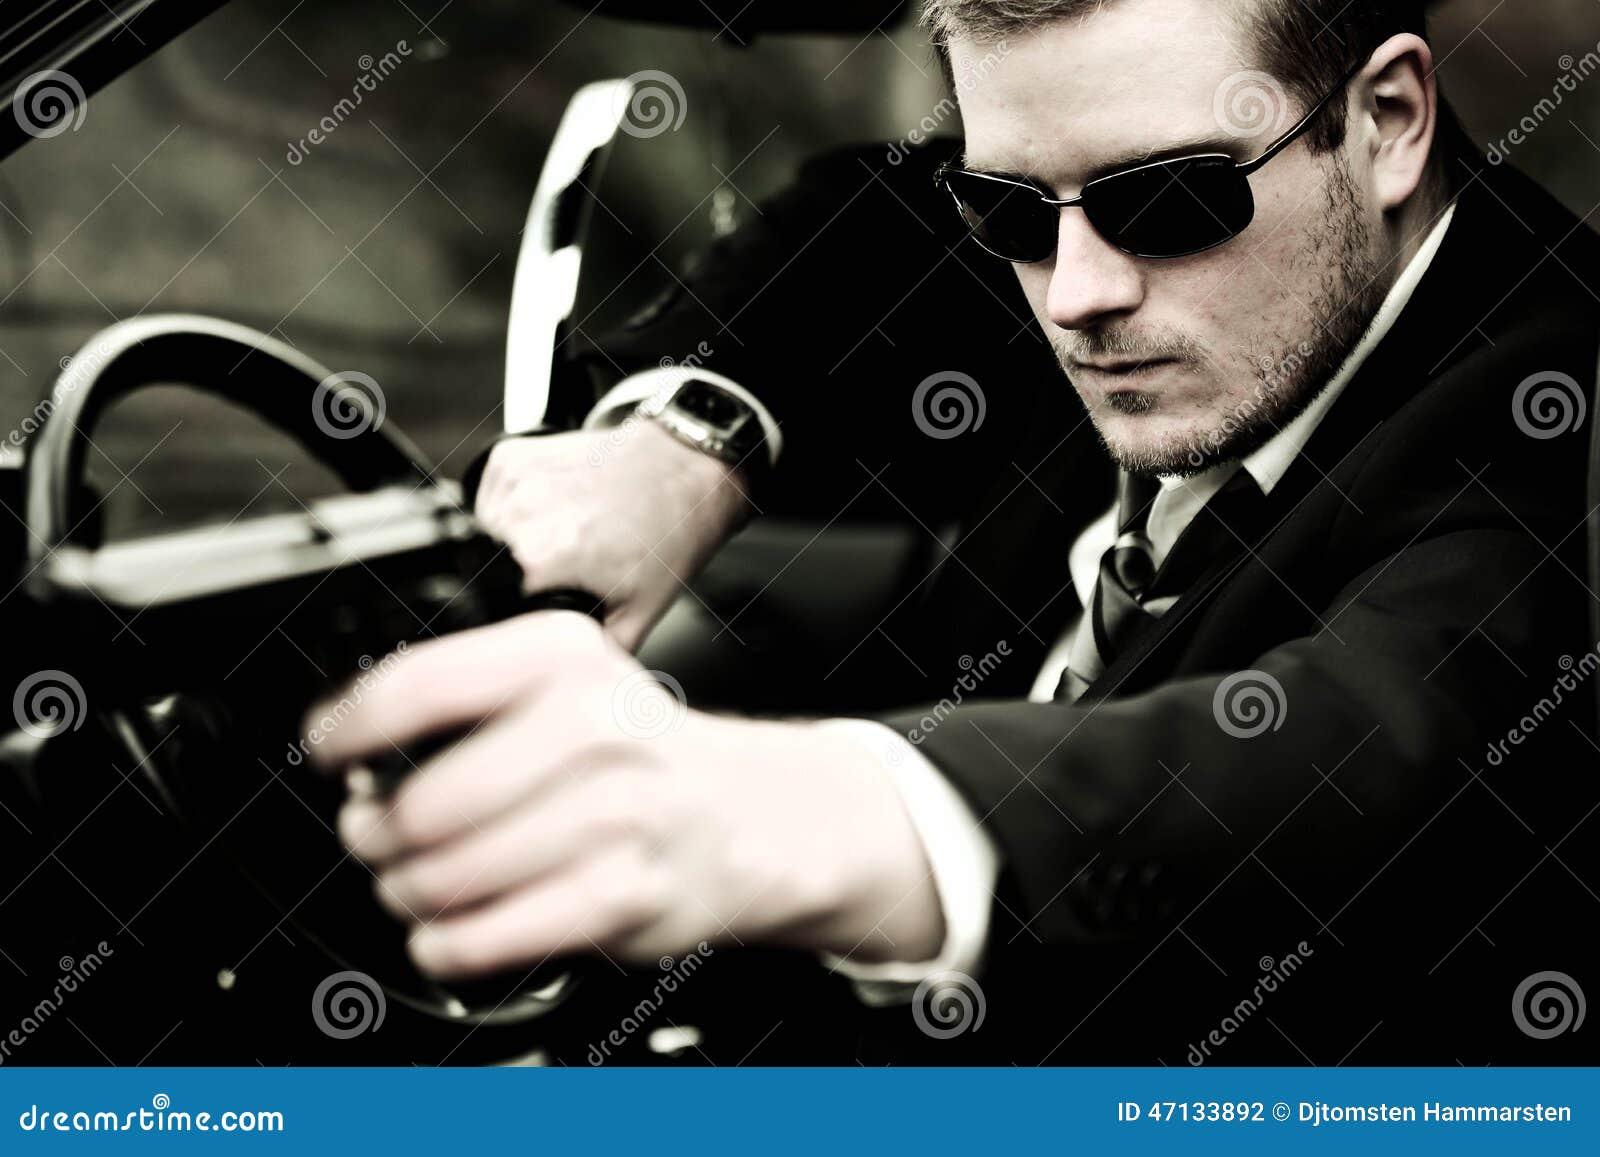 Mannen drar ett vapen i bil